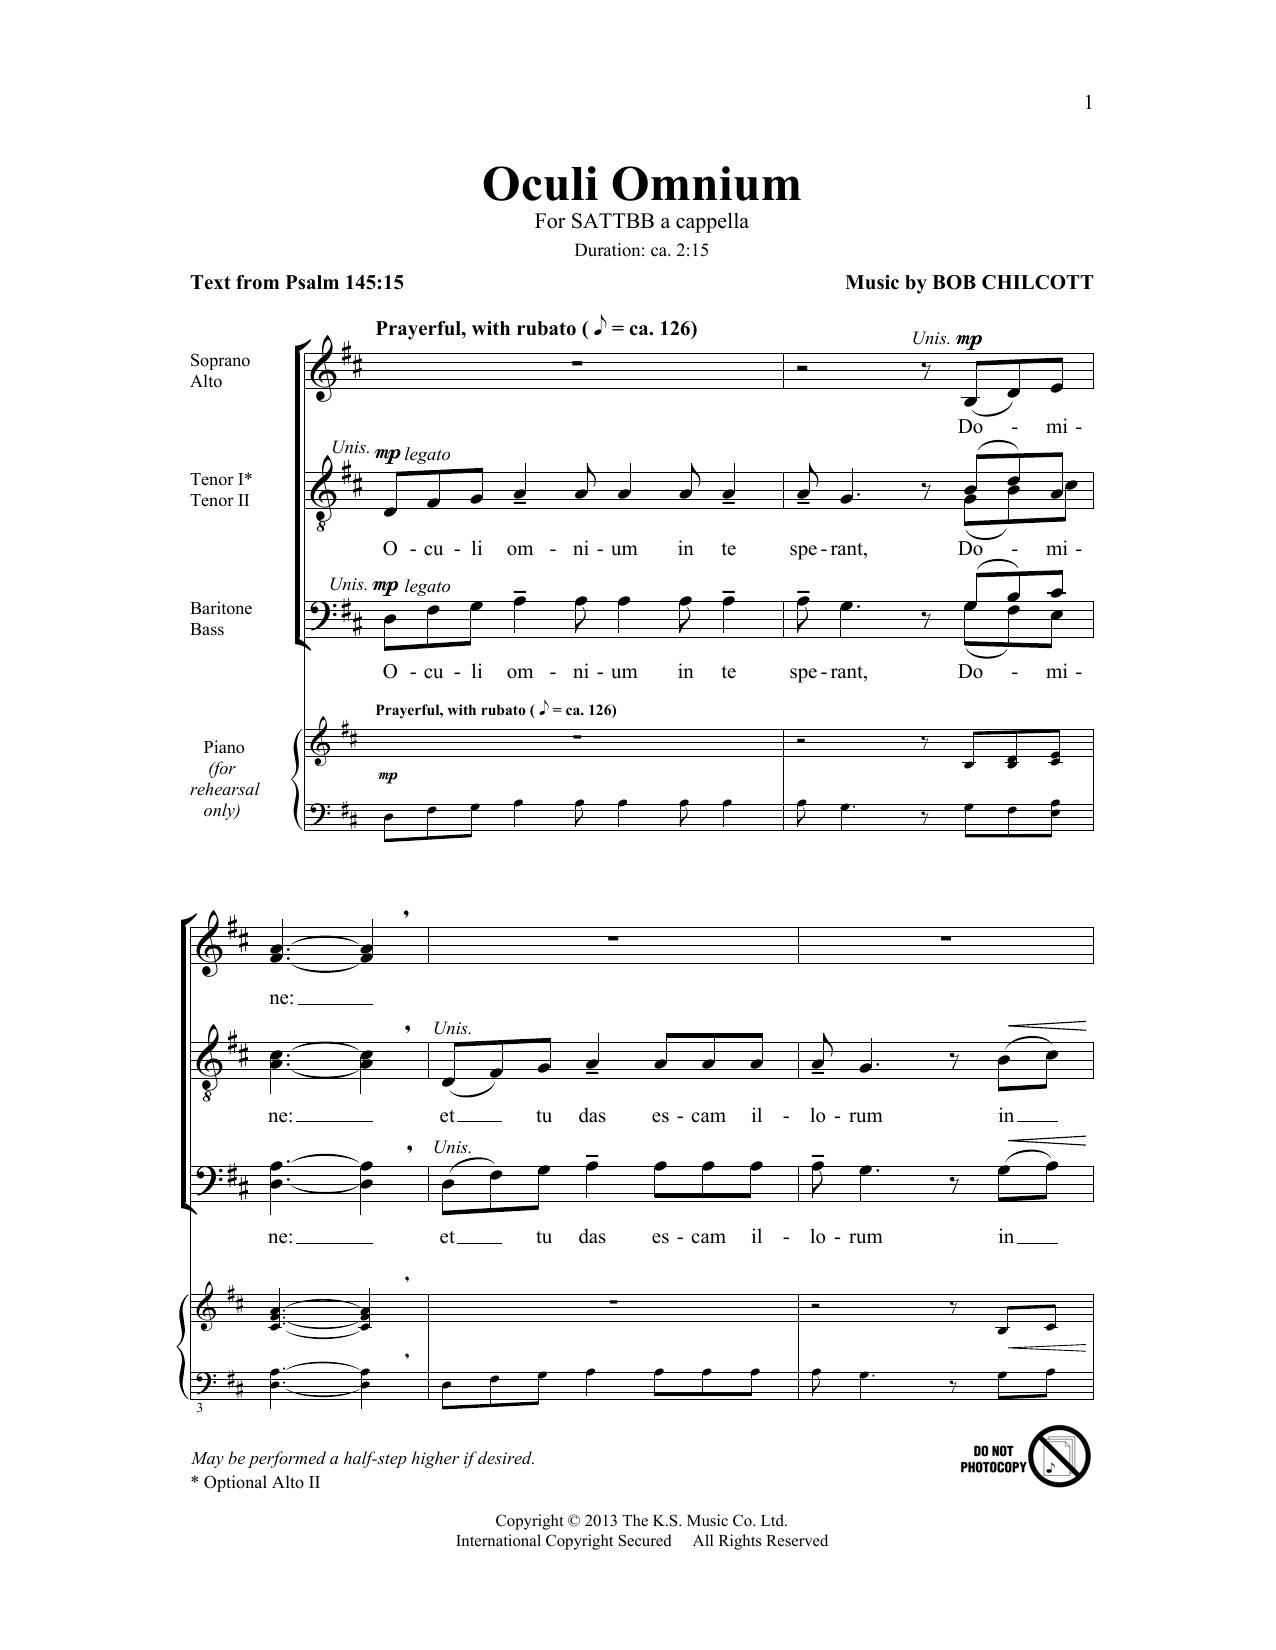 Oculi Omnium Sheet Music